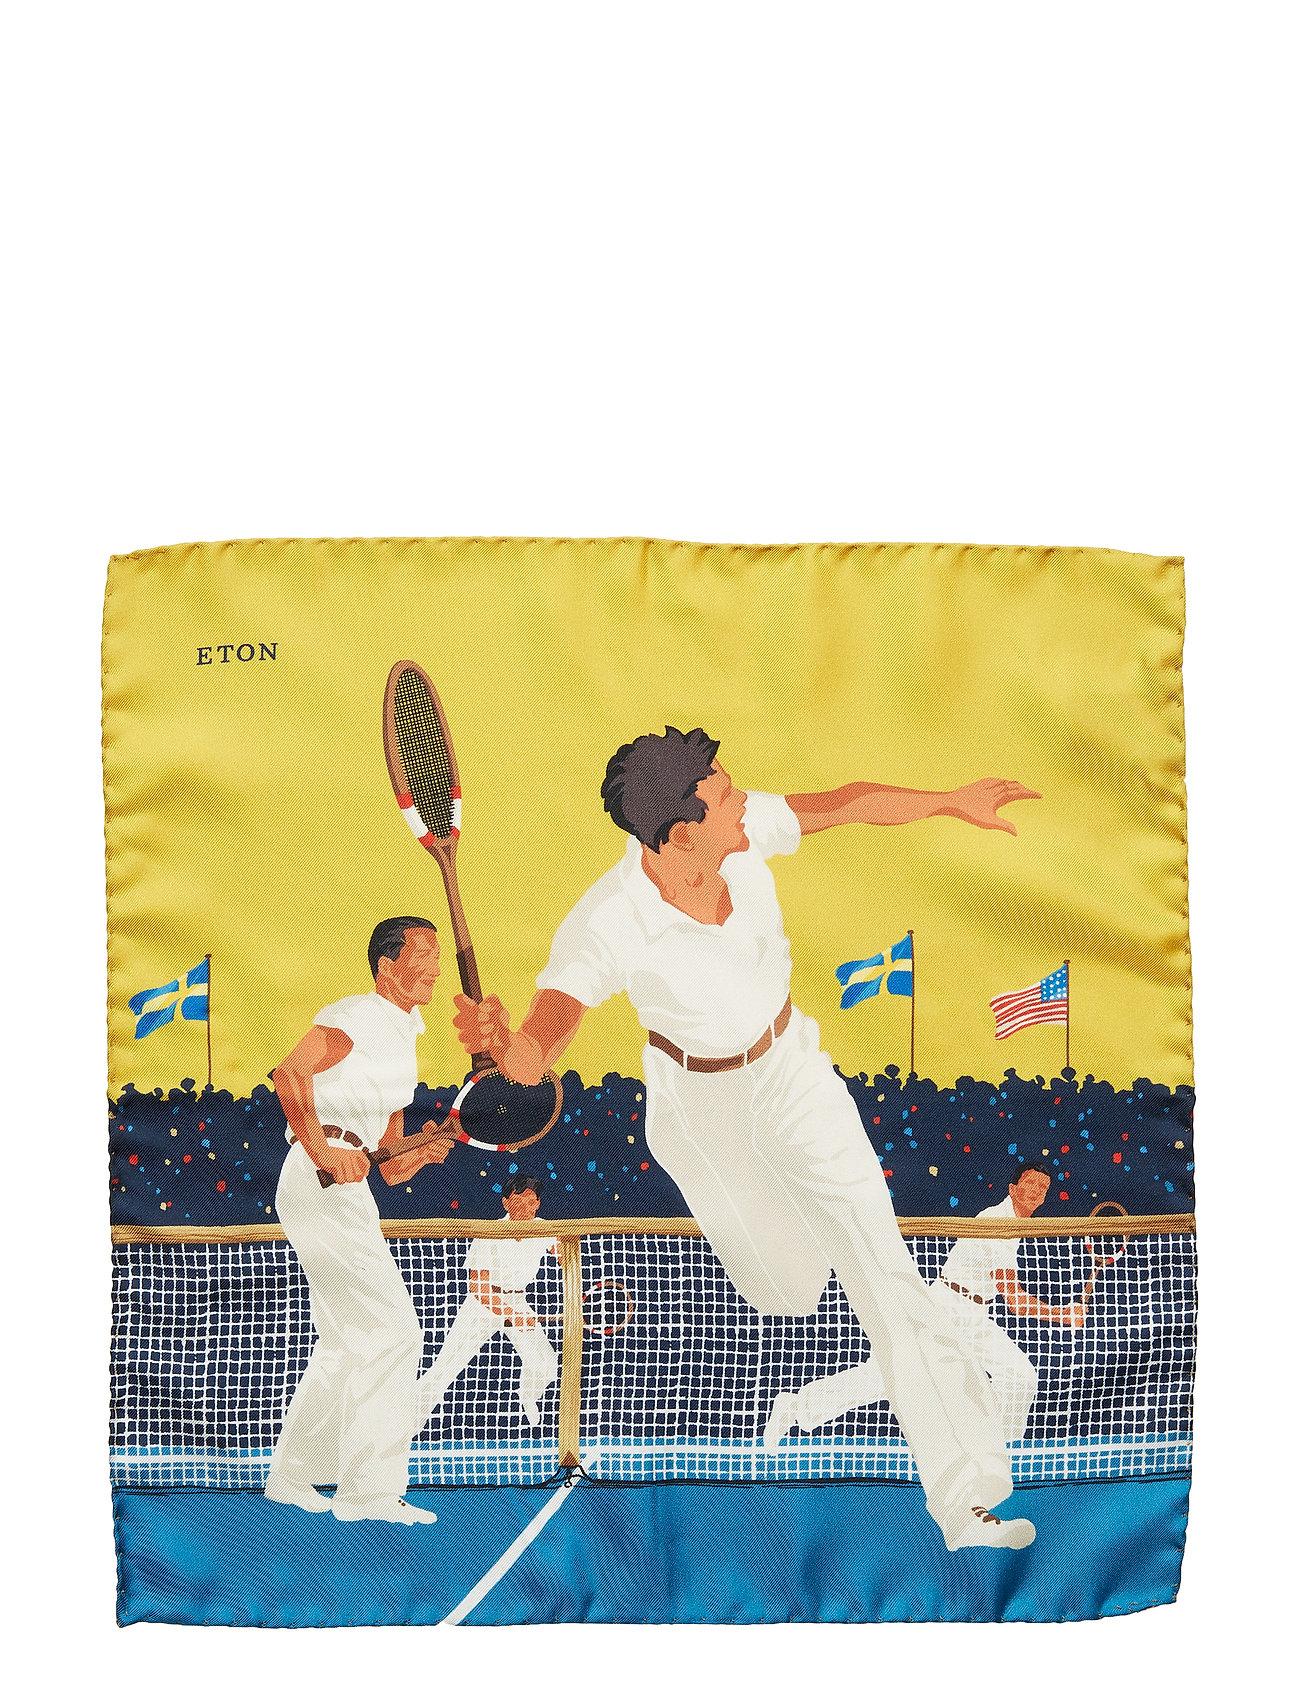 Green Tennis Game Pocket Square Brystlommetørklæde Gul ETON